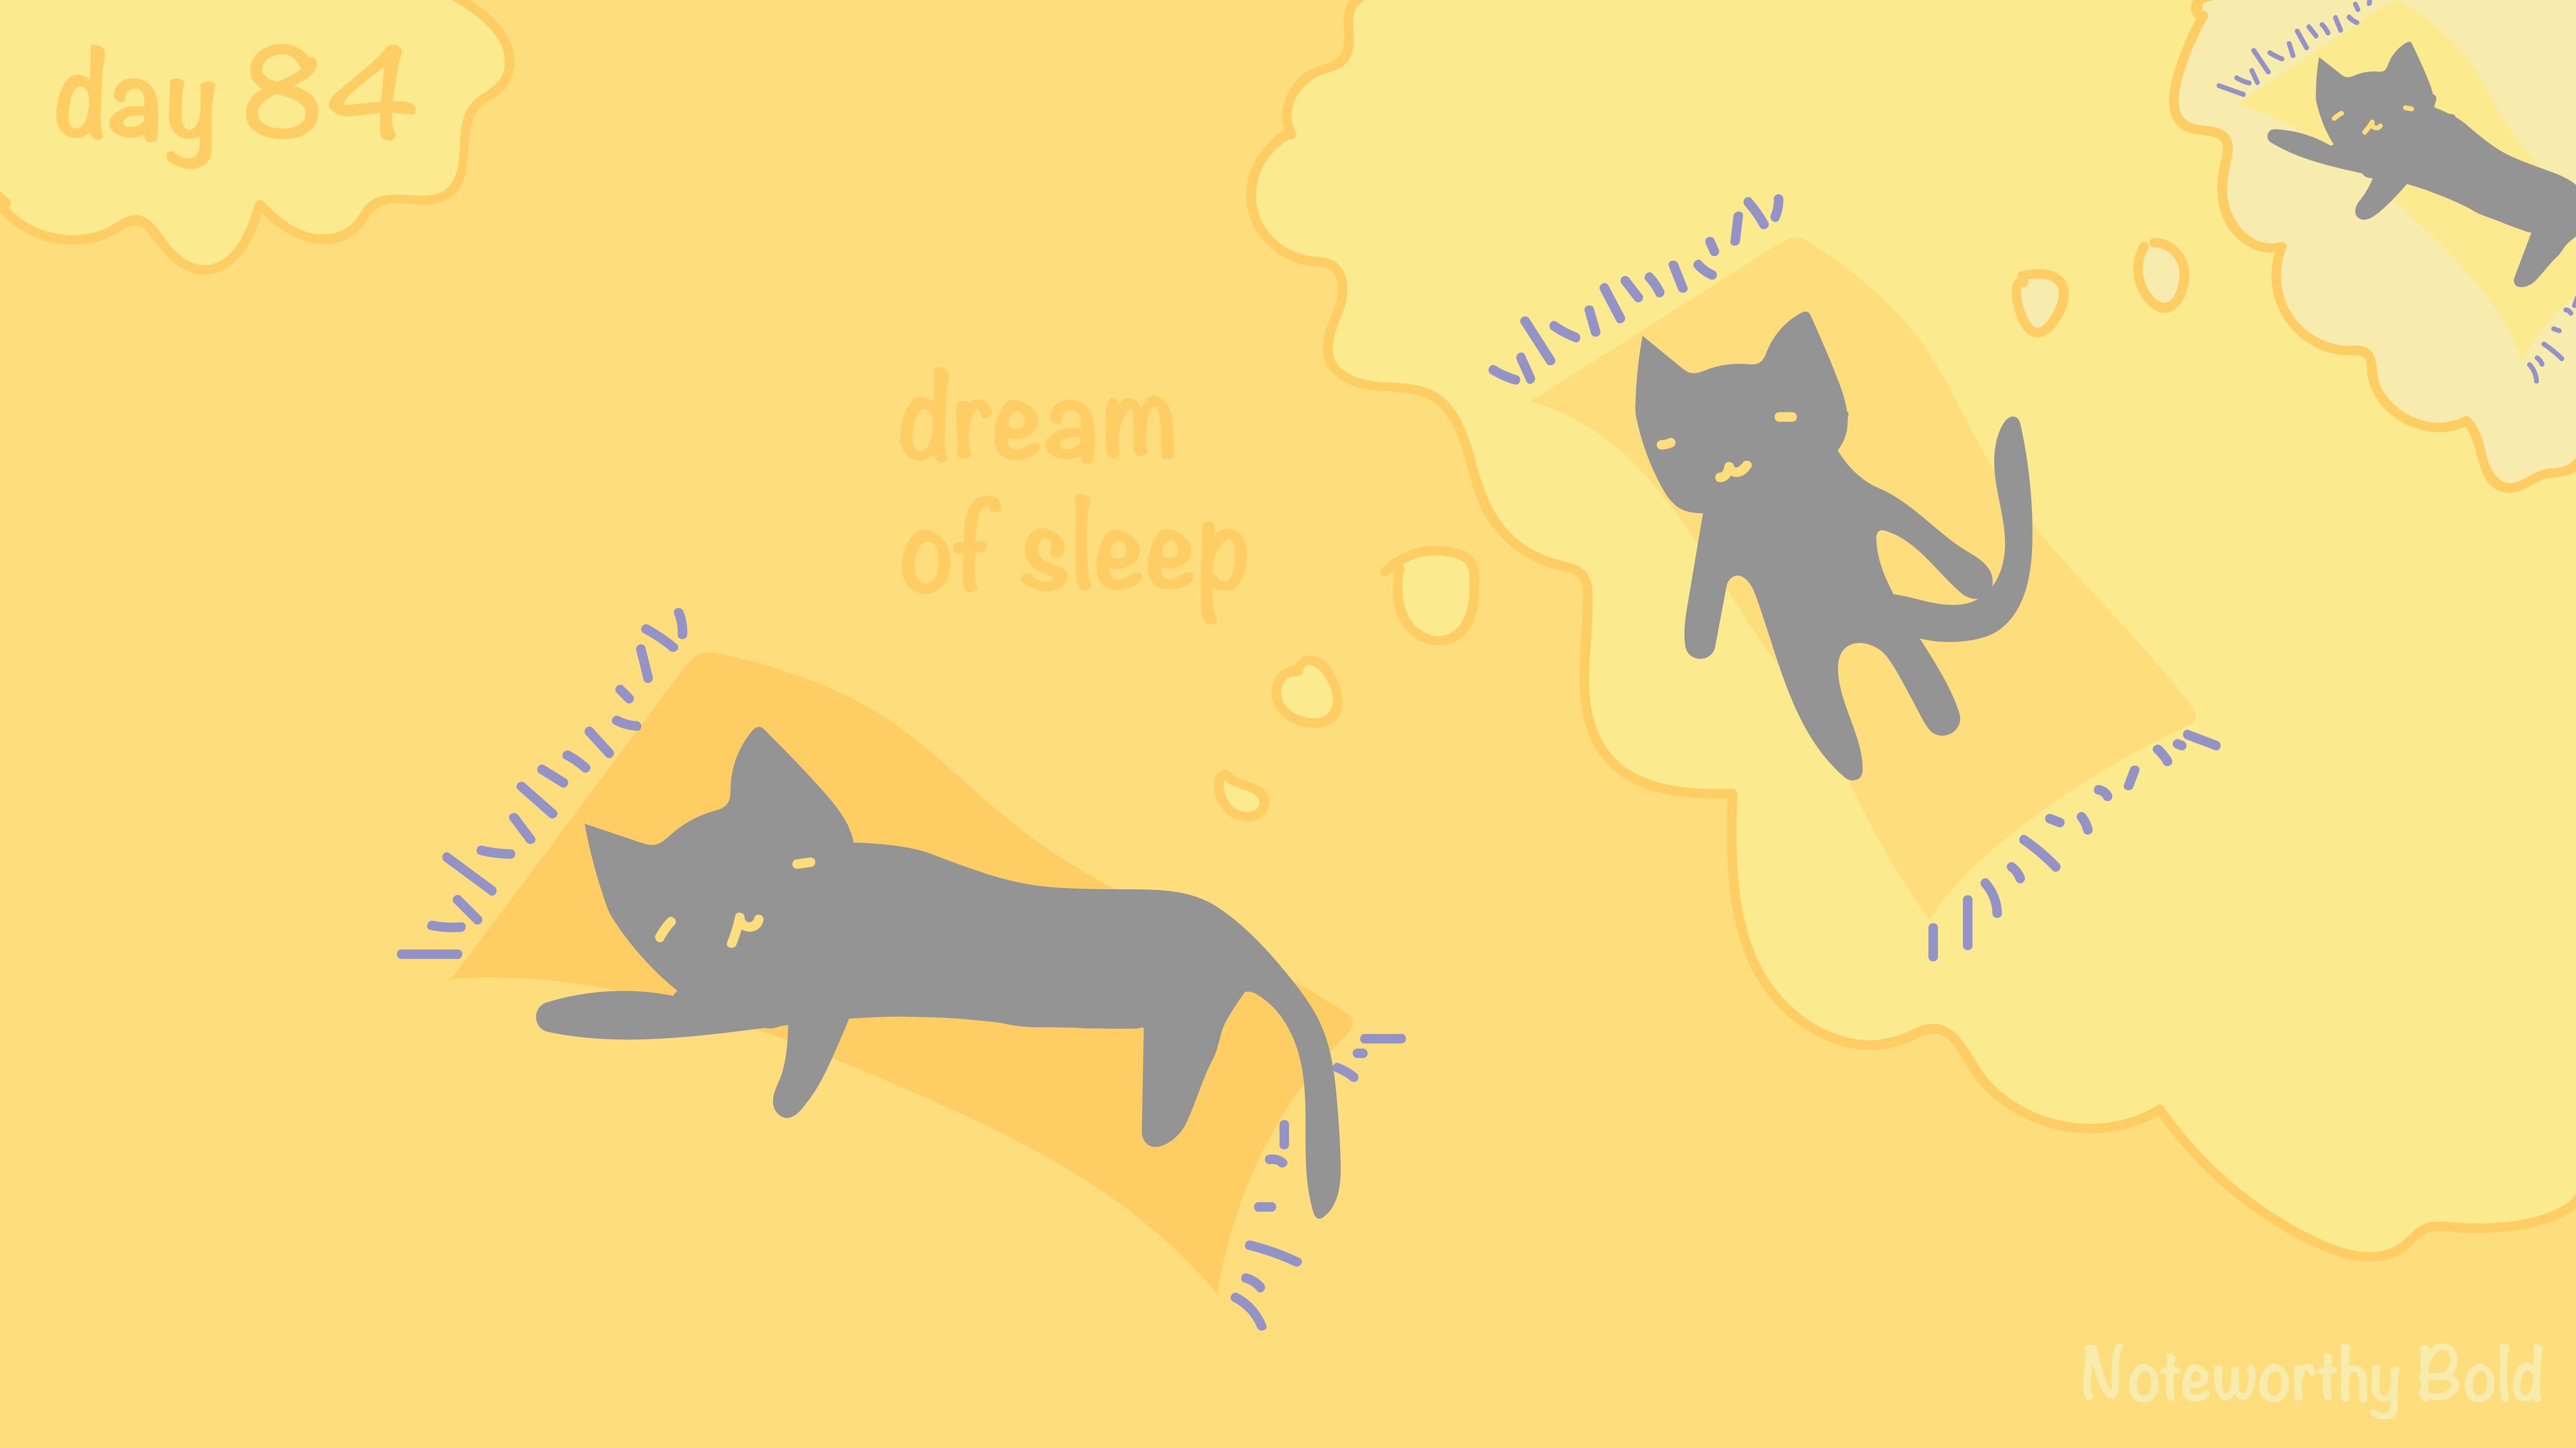 [cat]day8-04